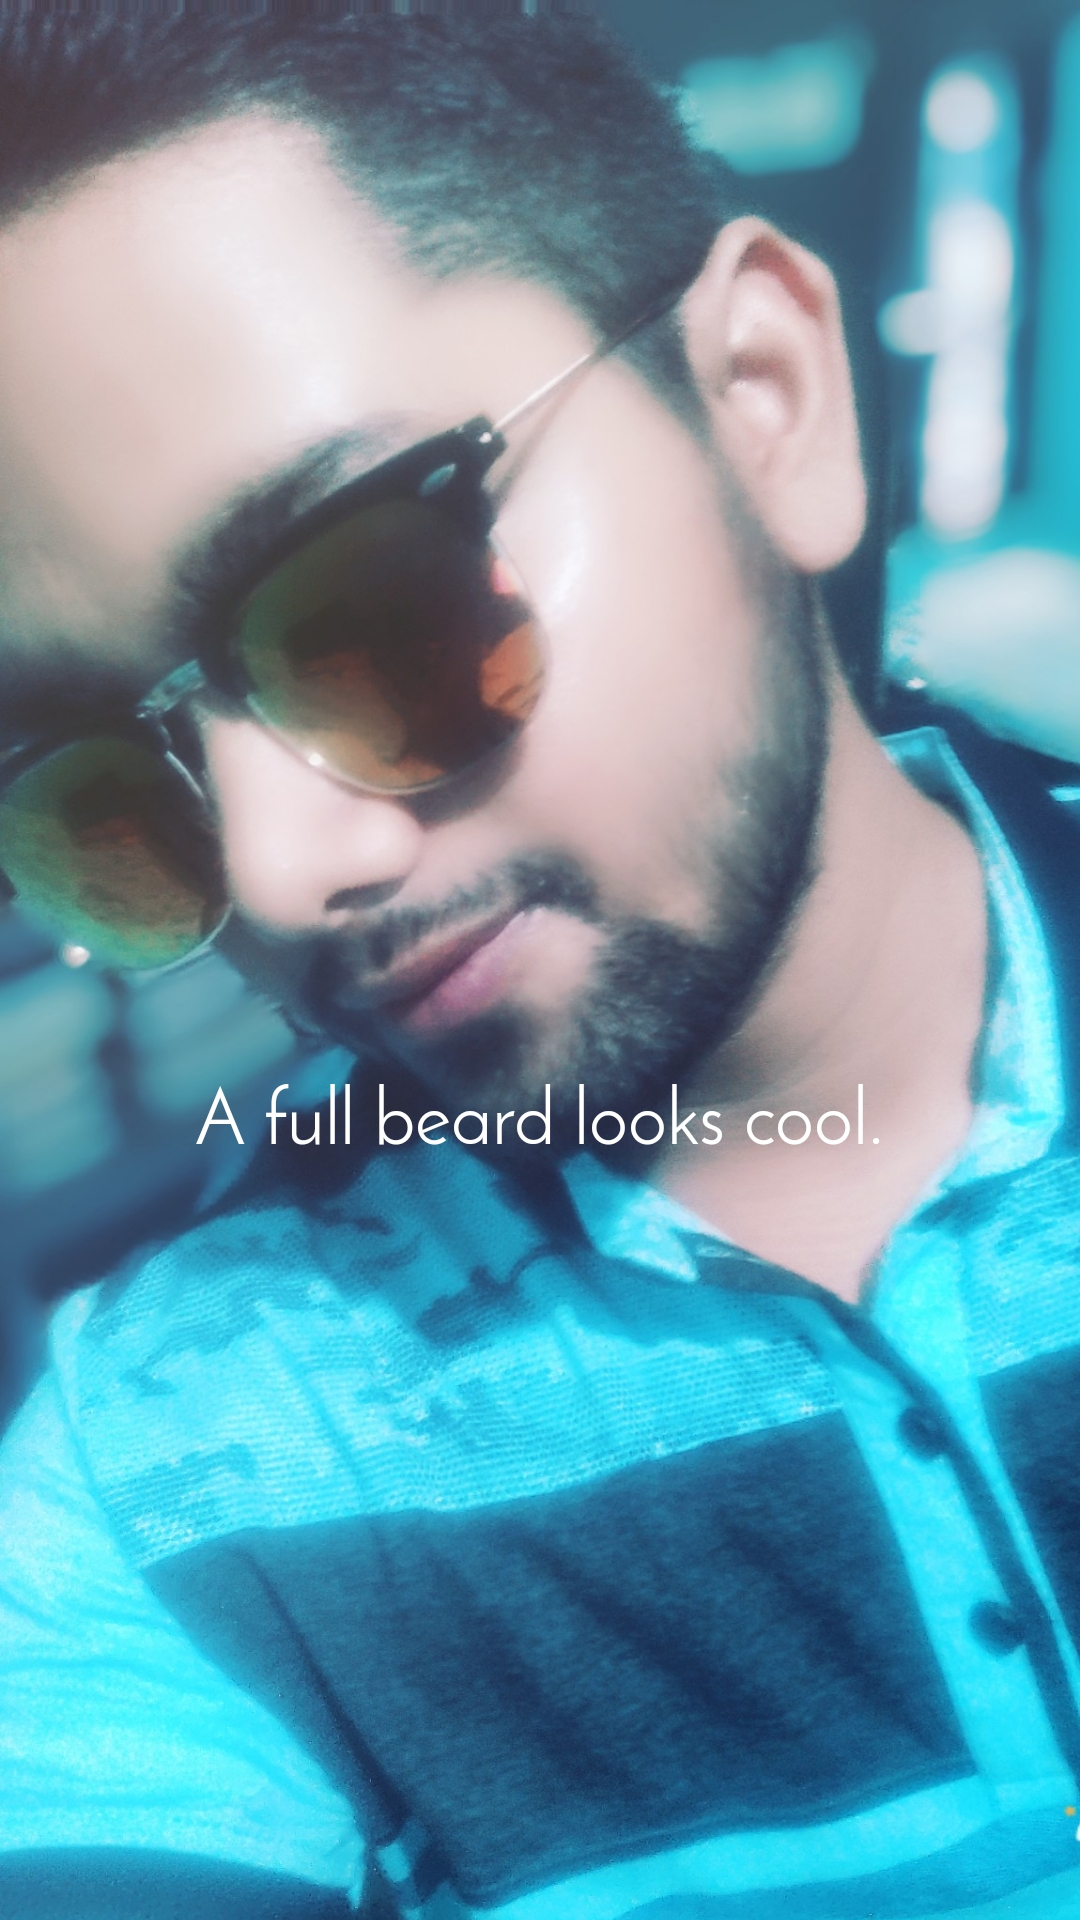 A full beard looks cool.